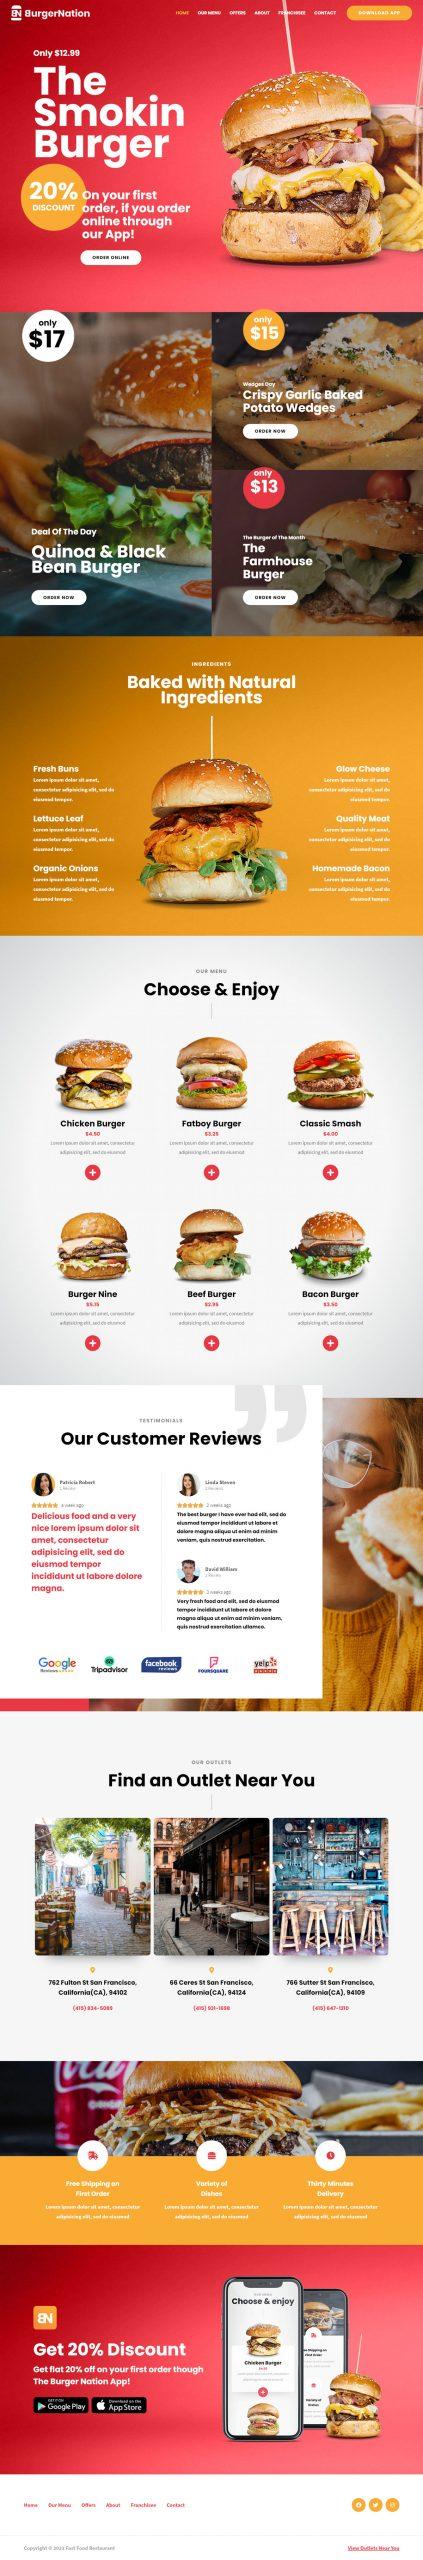 Adamo Web Design | Web Design Durham | fast food 02 home scaled